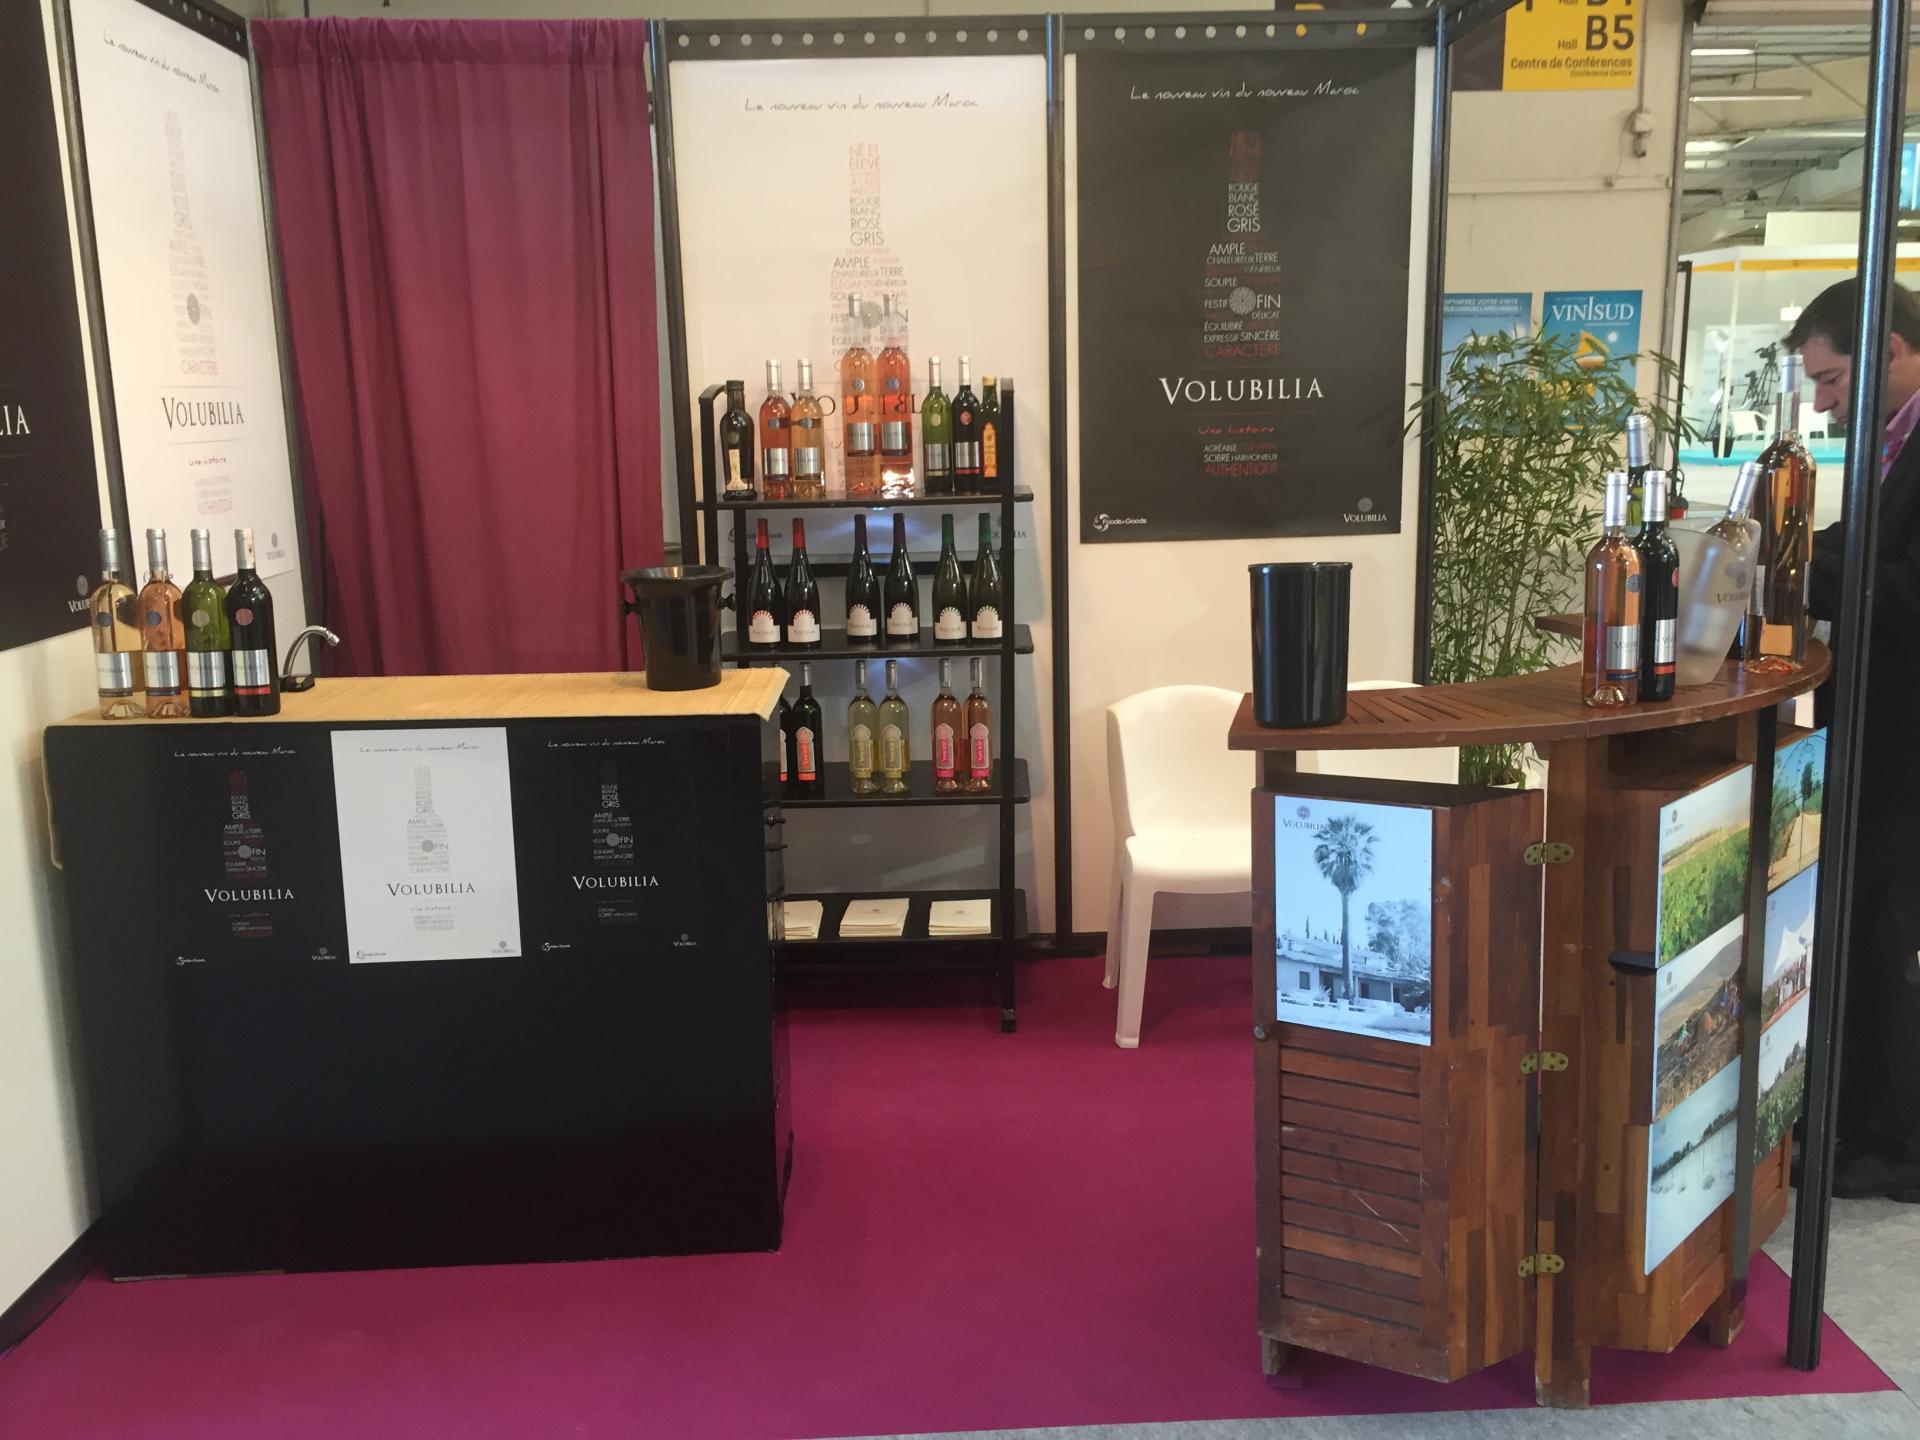 Le stand Volubilia au salon Vinisud (2016)